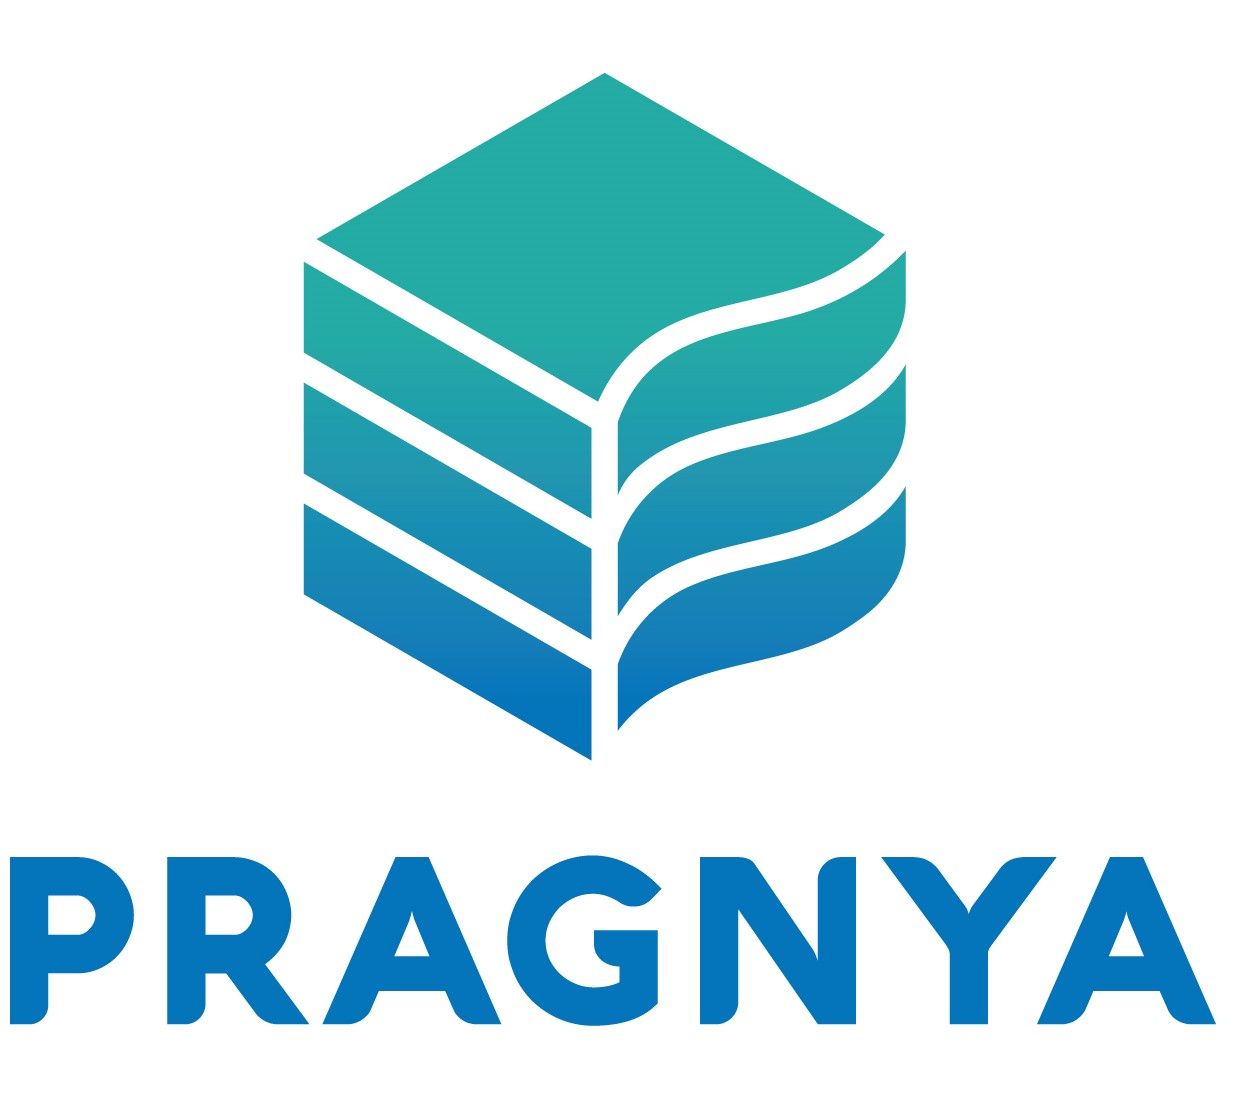 Pragnya Builders